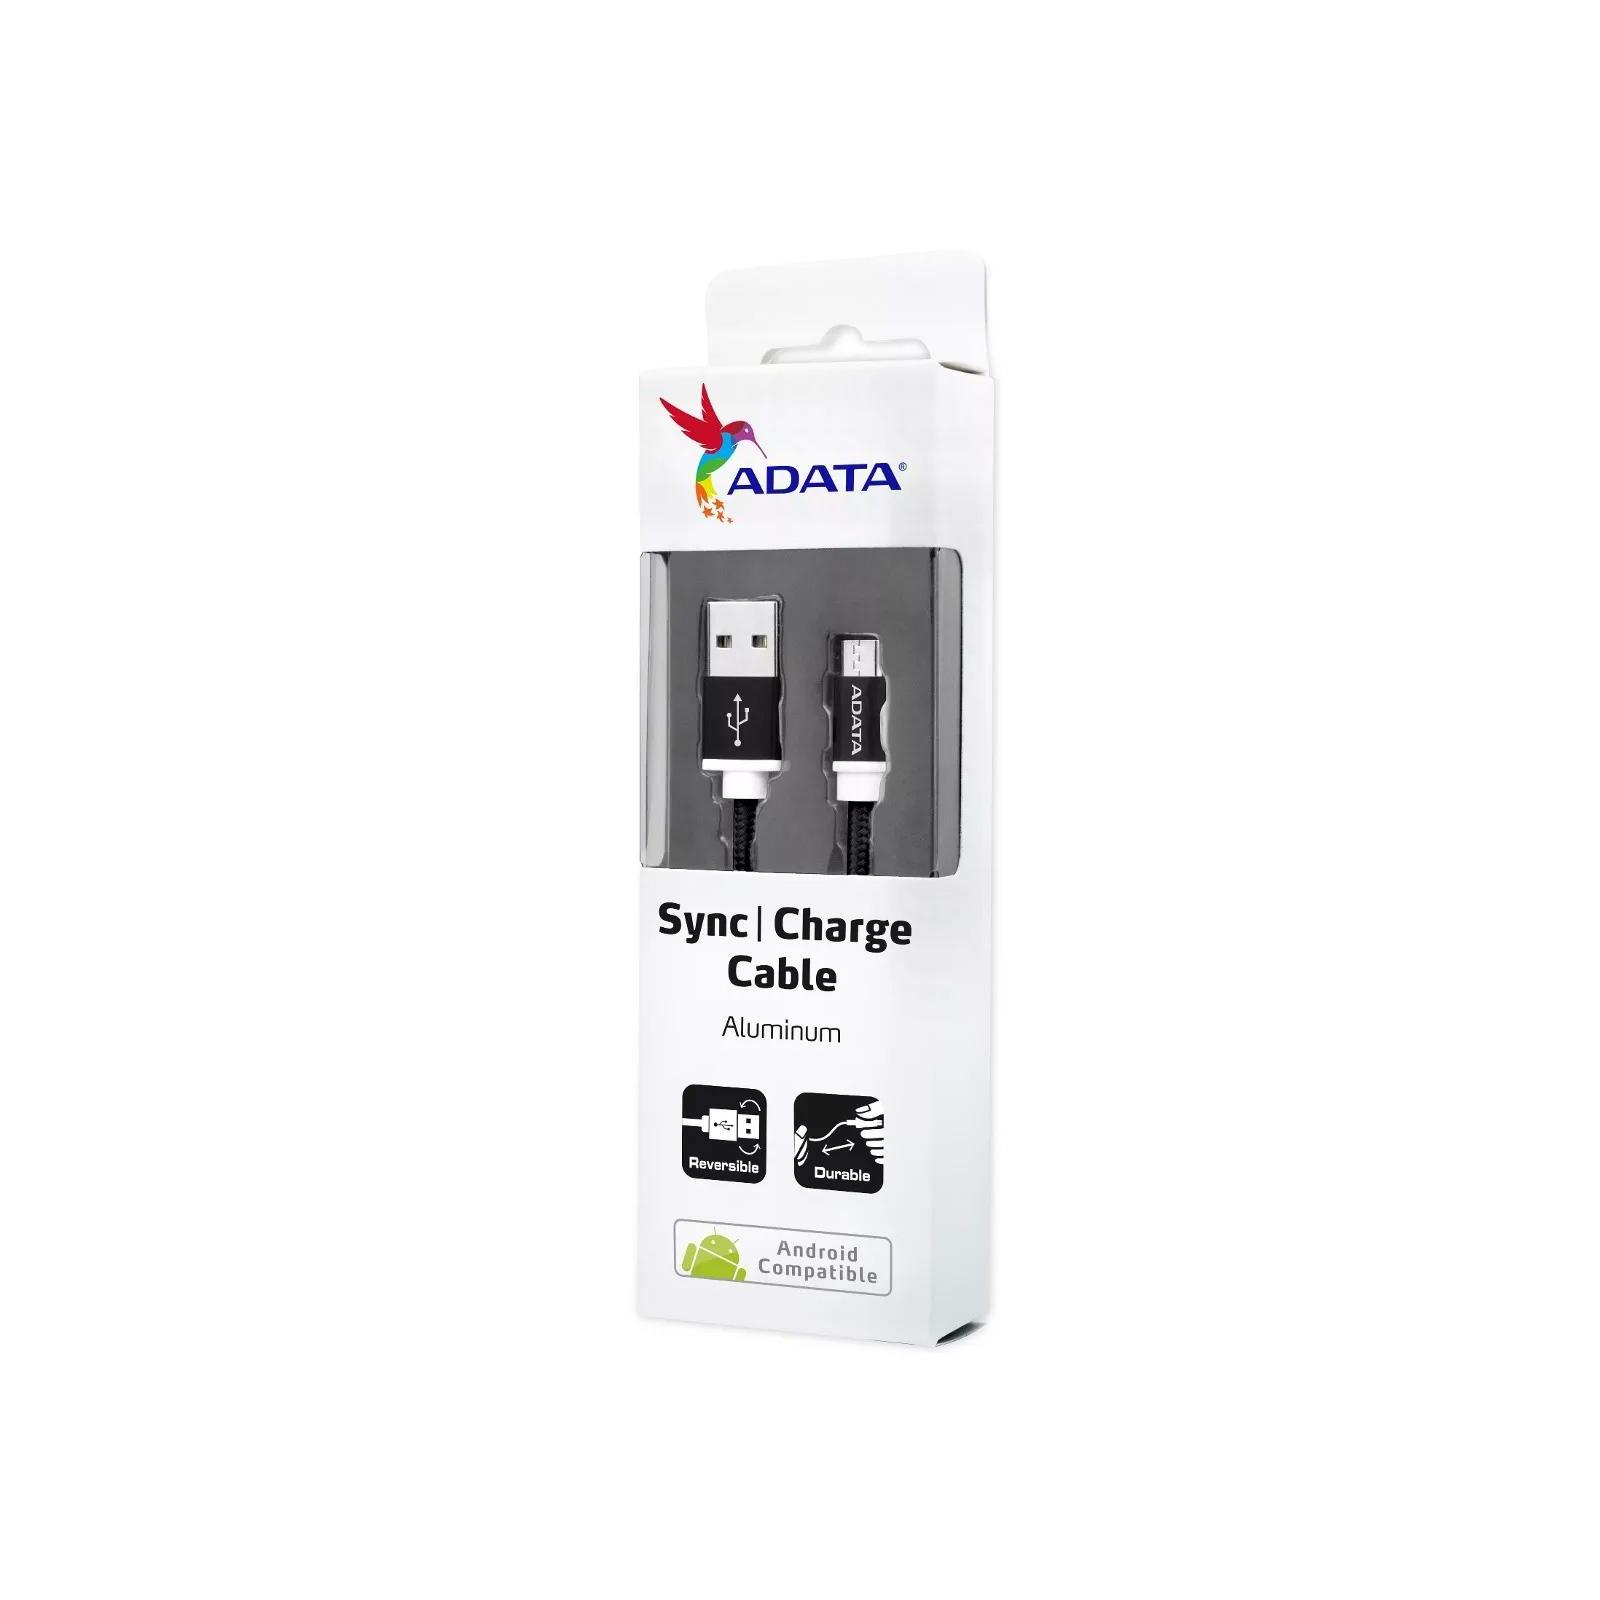 Дата кабель USB 2.0 AM to Micro 5P 1.0m Black ADATA (AMUCAL-100CMK-CBK) изображение 4